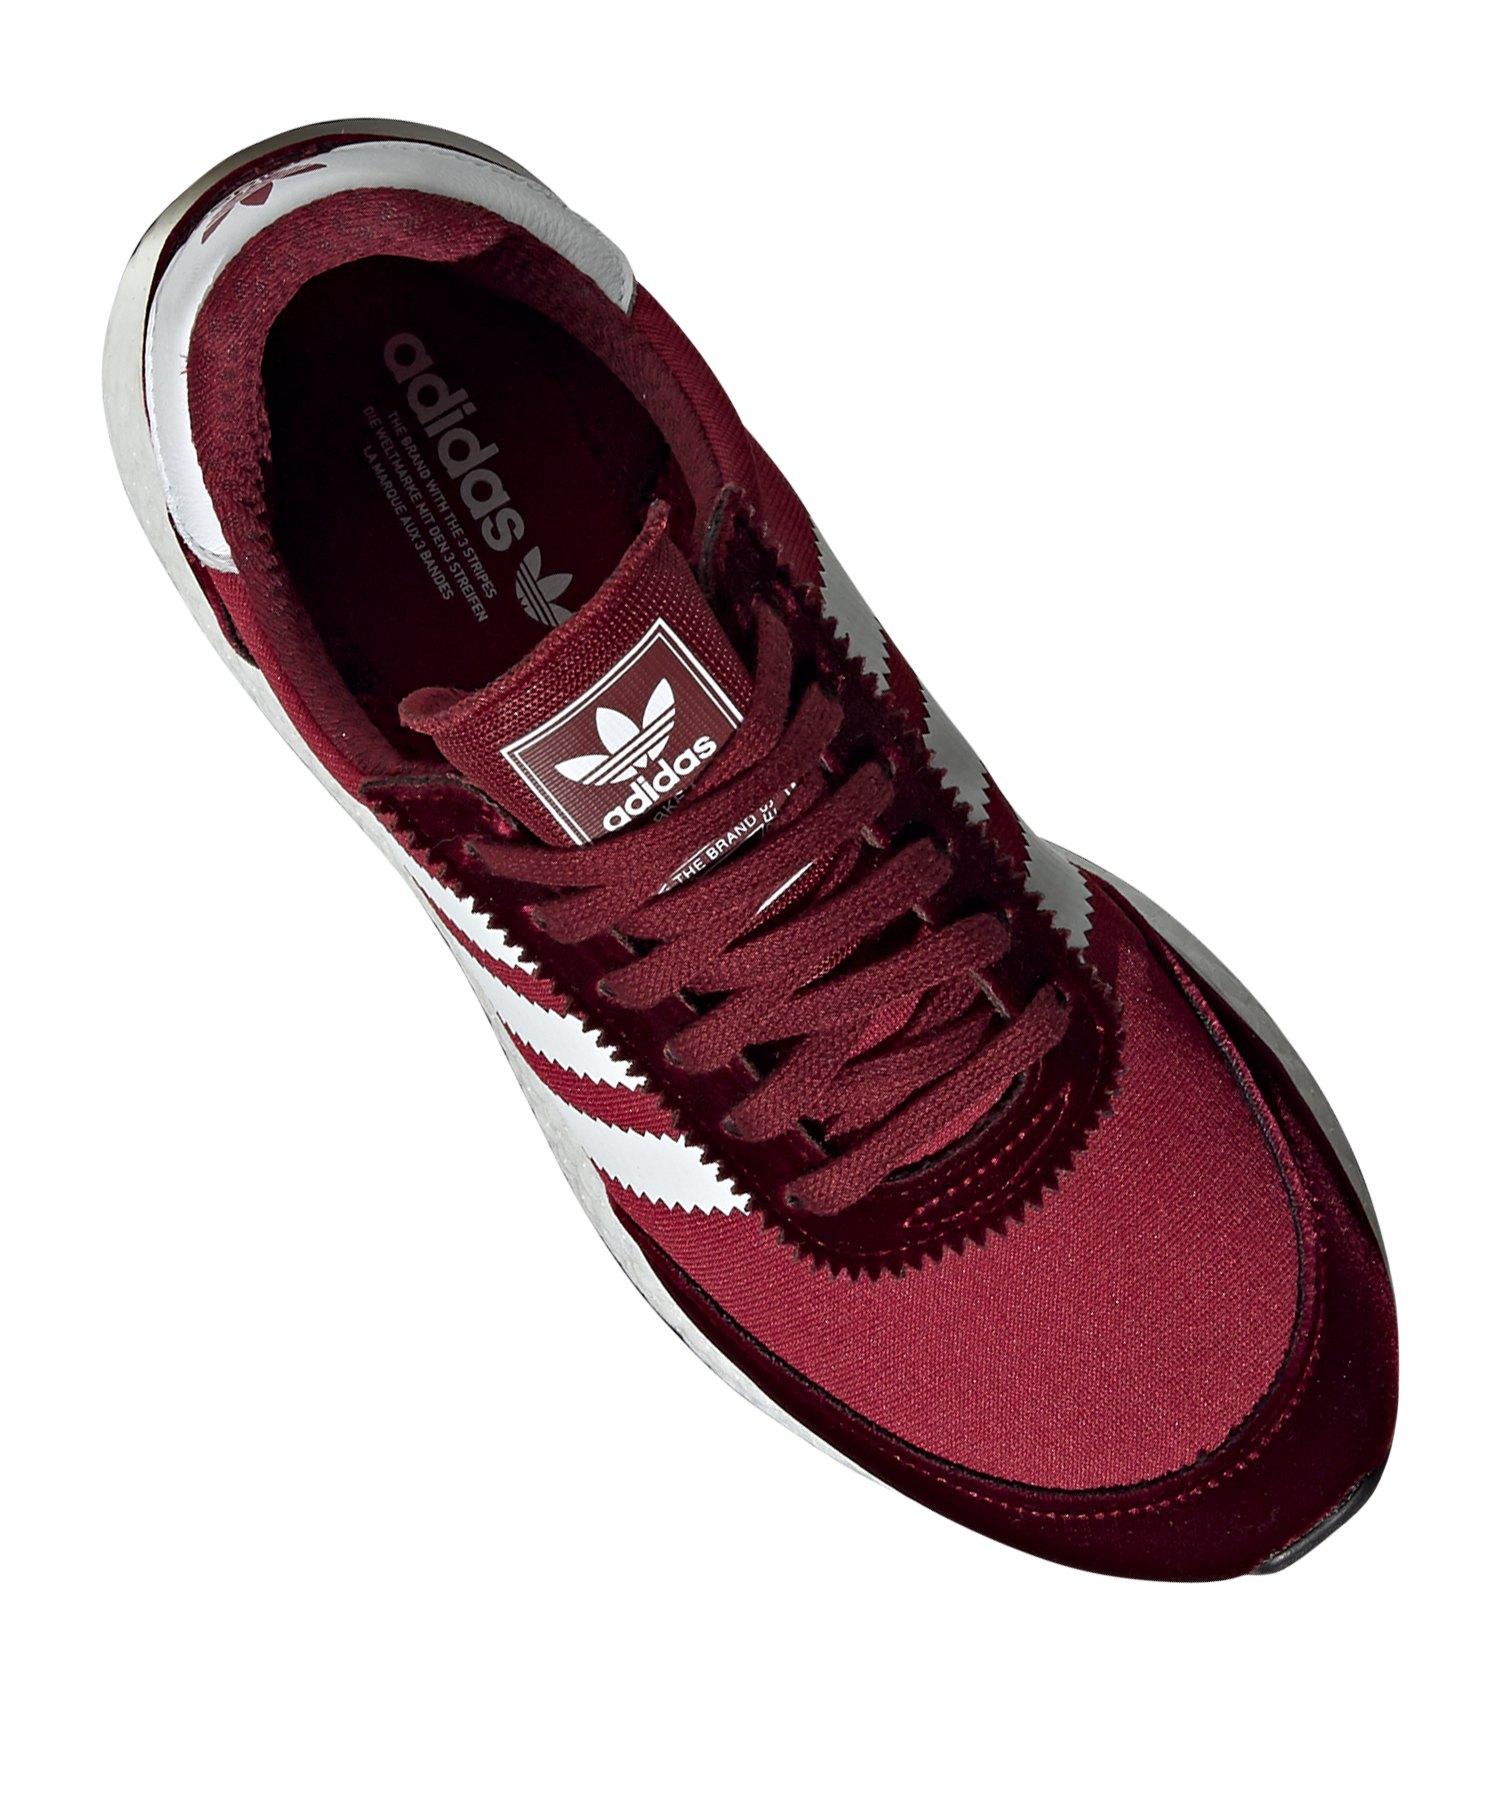 adidas Herren I 5923 Schwarz MeshWildleder Sneaker 36 23